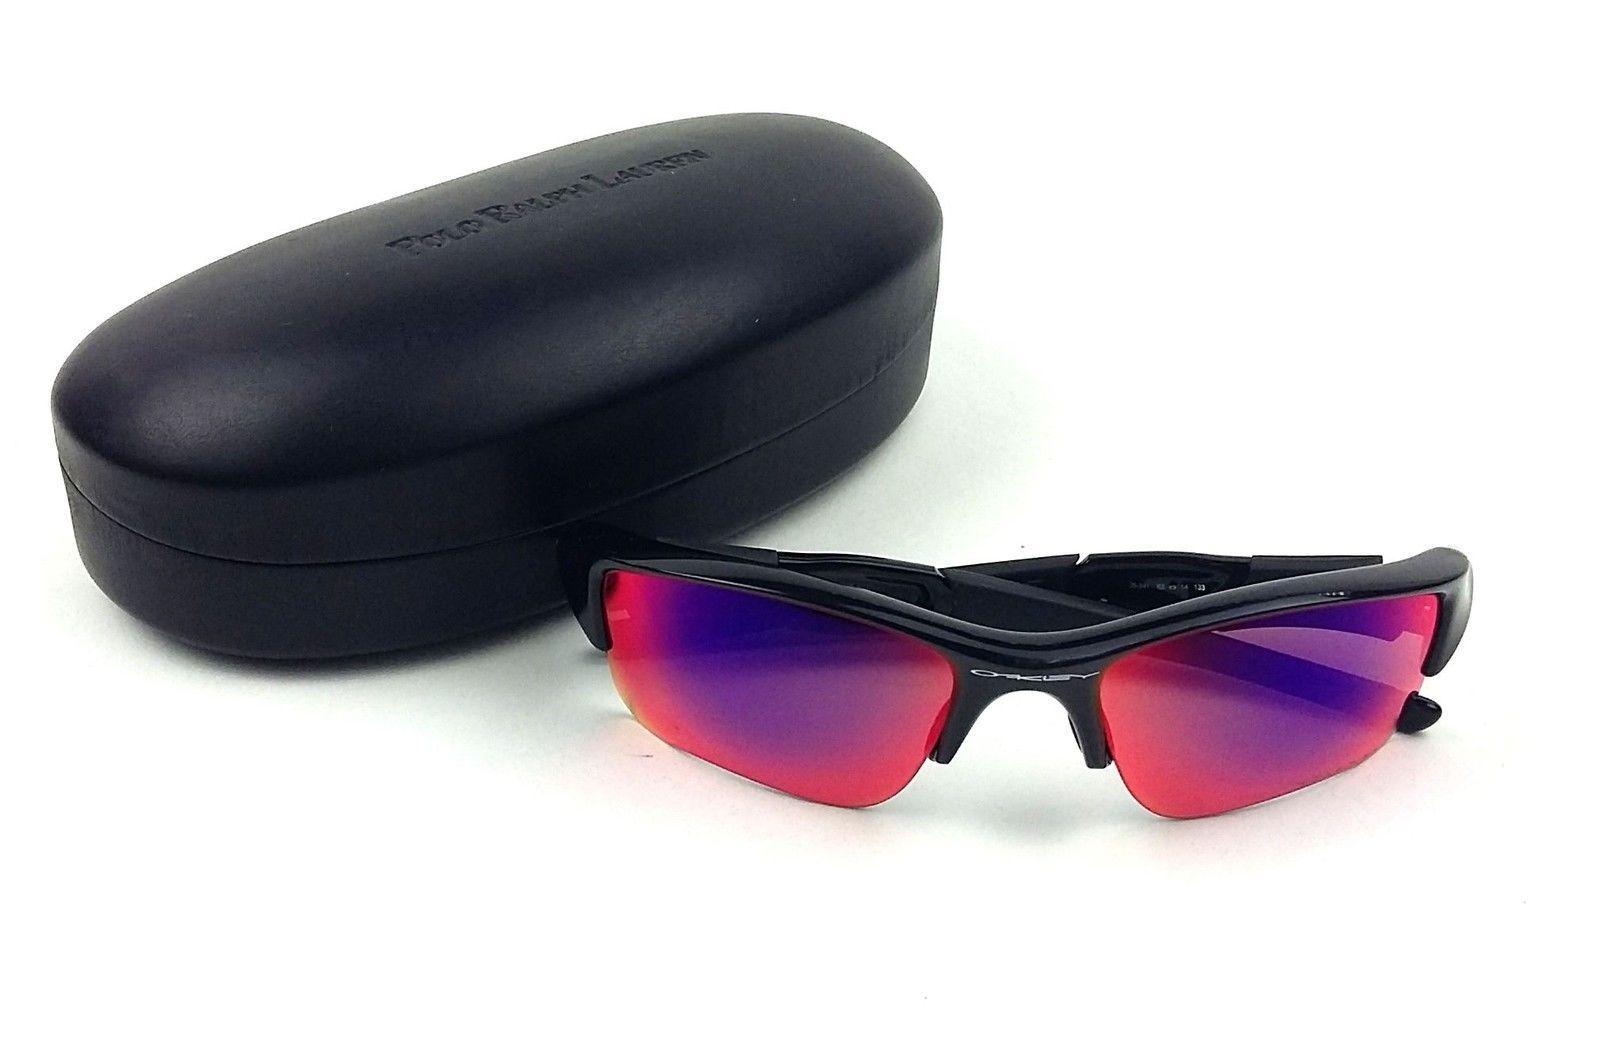 313d2507d29 Oakley Flak Jacket XLJ 26-241 Polarized Sports Sunglasses for sale ...